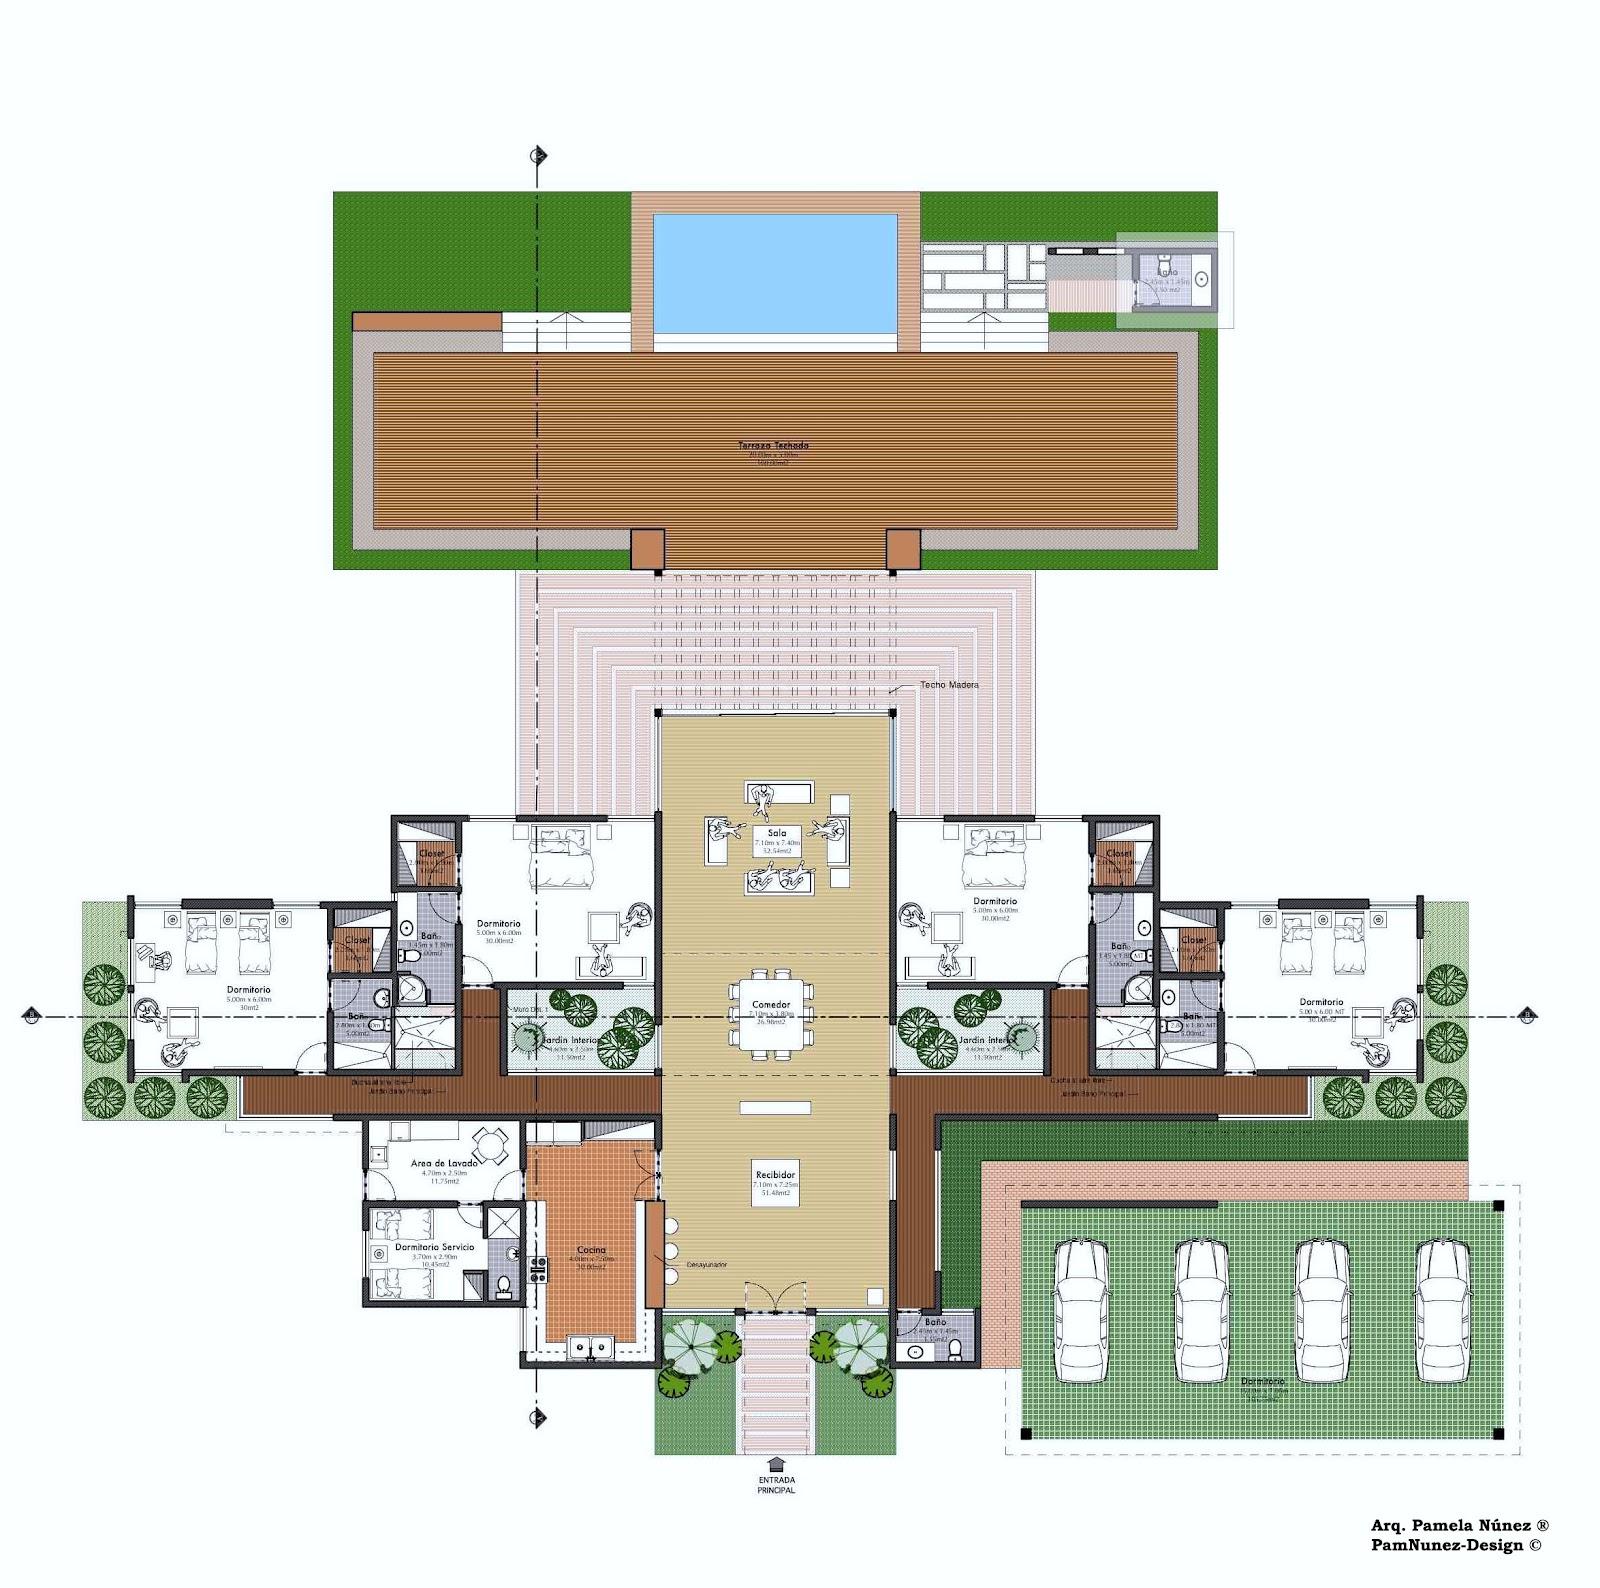 Pamnunez designs colaboraci n dise o casa tercer vivienda - Programa para planos de viviendas ...